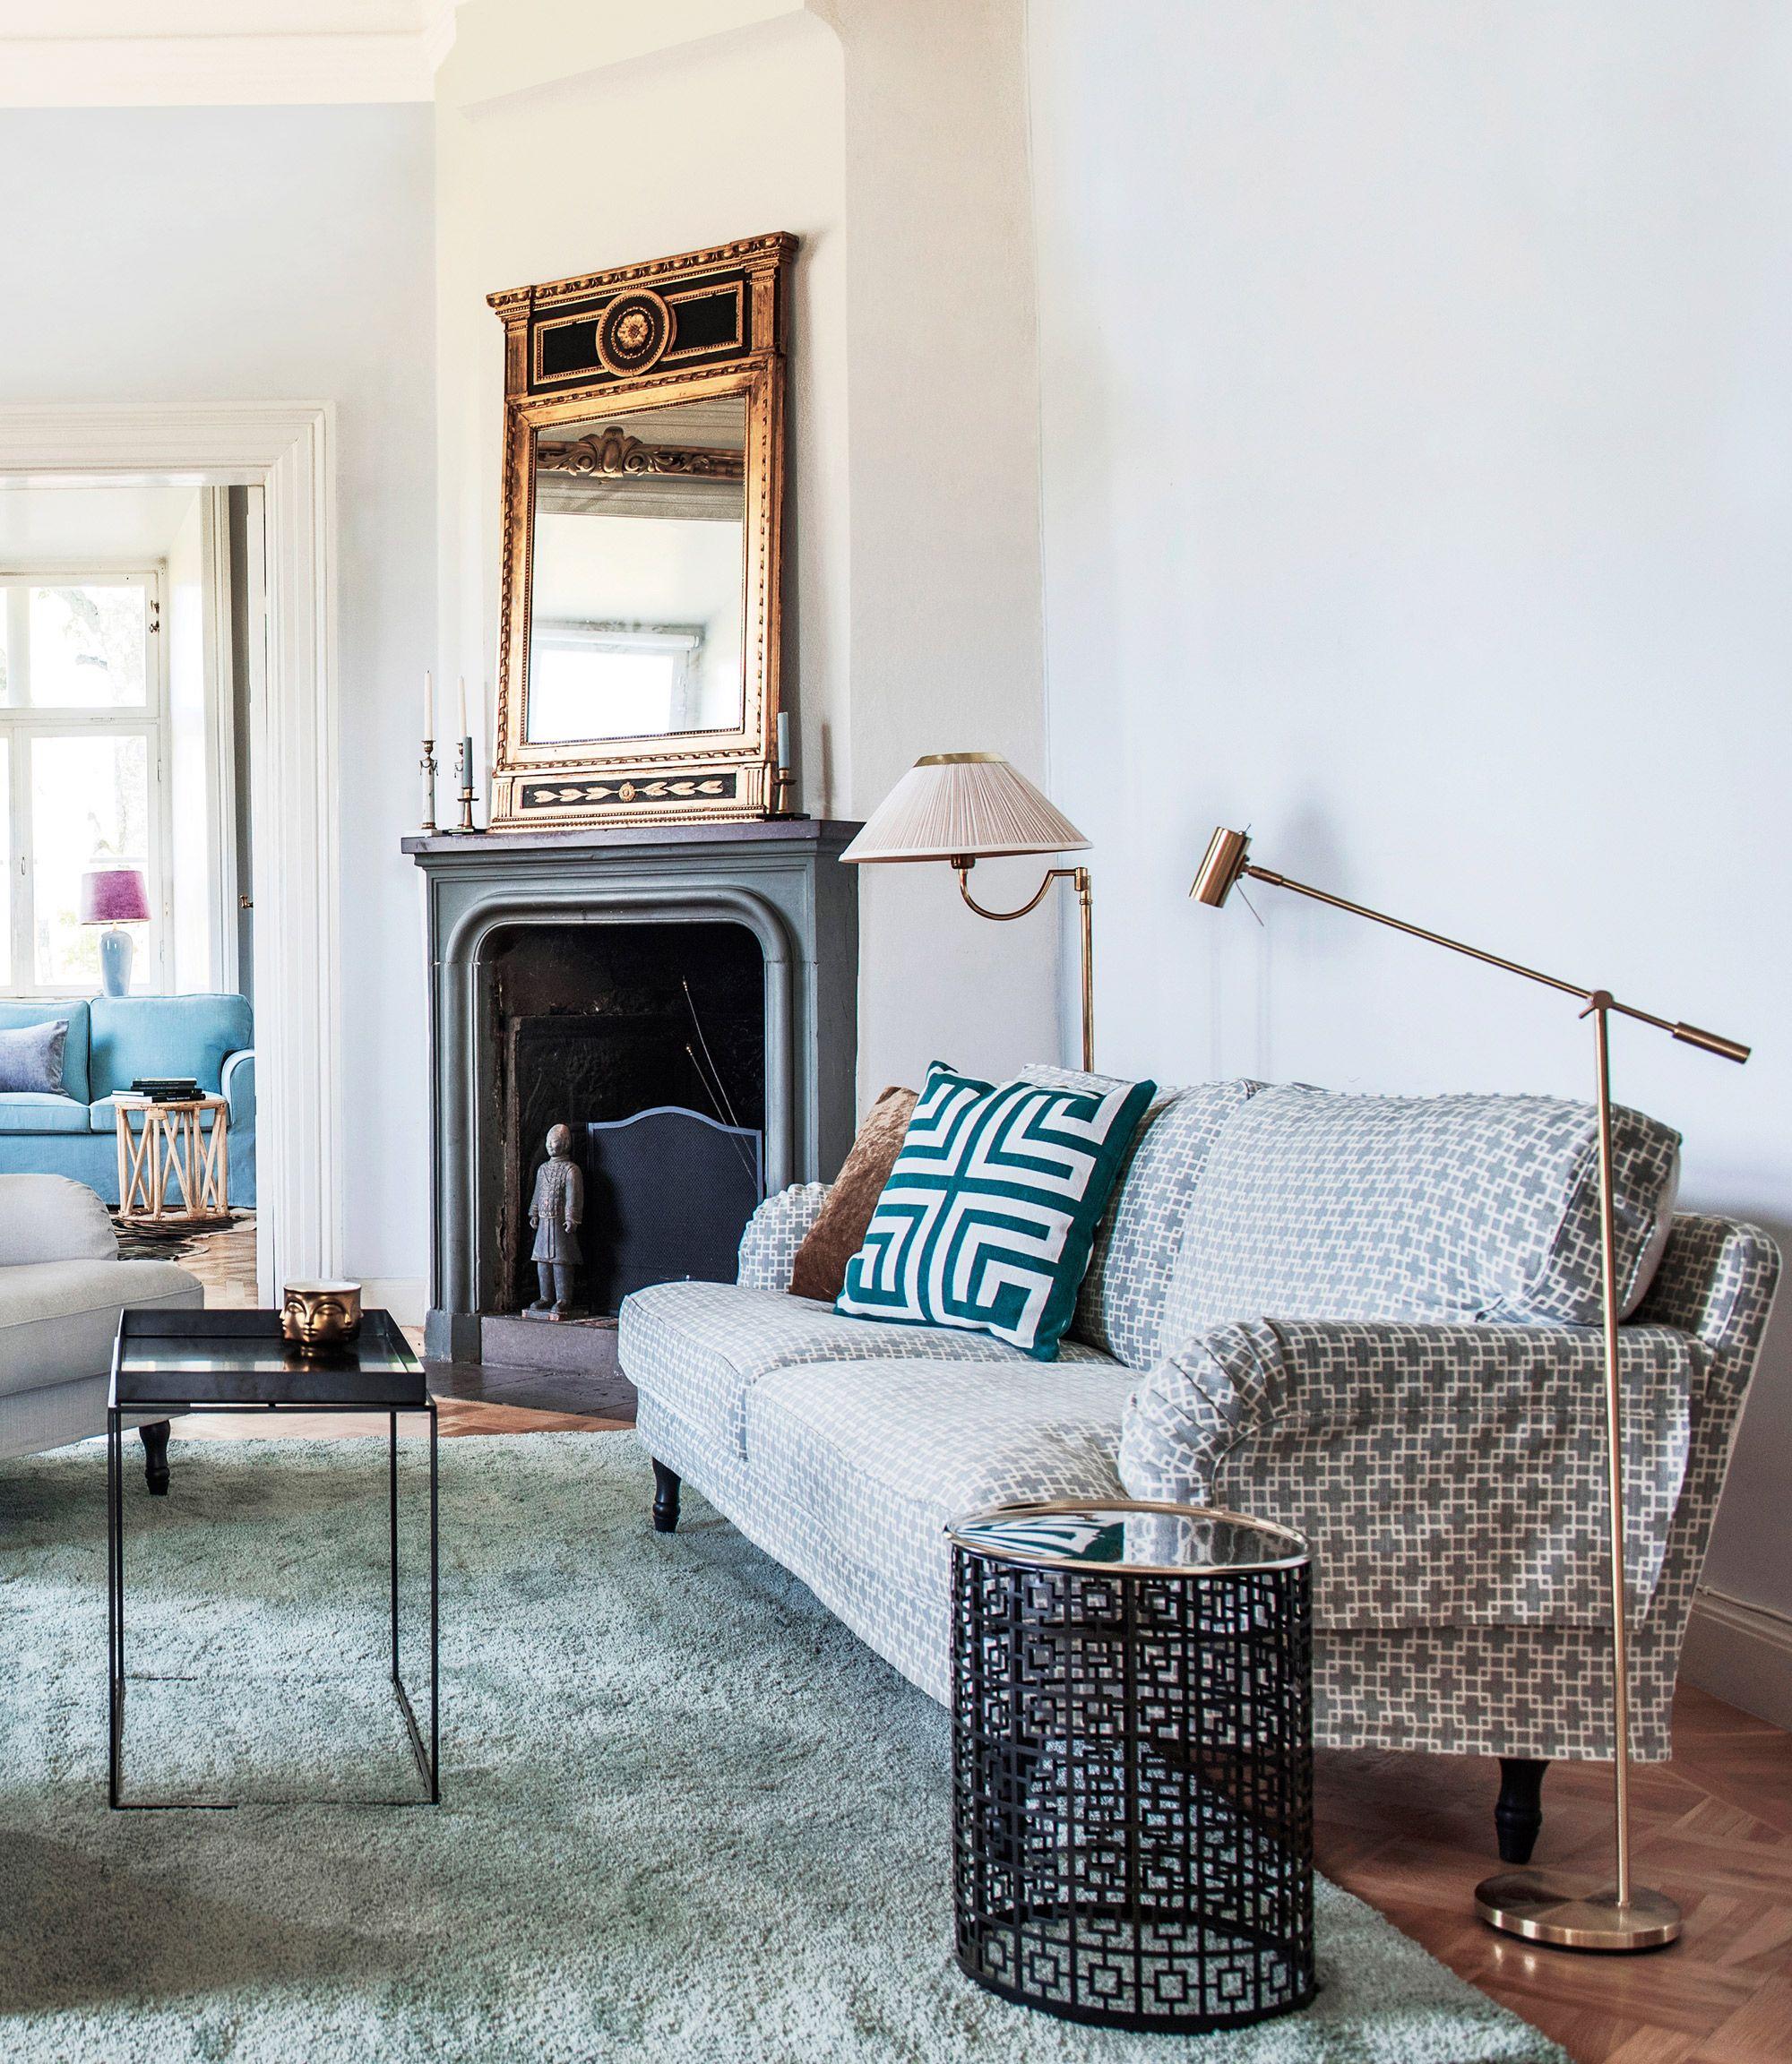 Stocksund 3 Seater Sofa Cover In 2019 B E M Z R O M